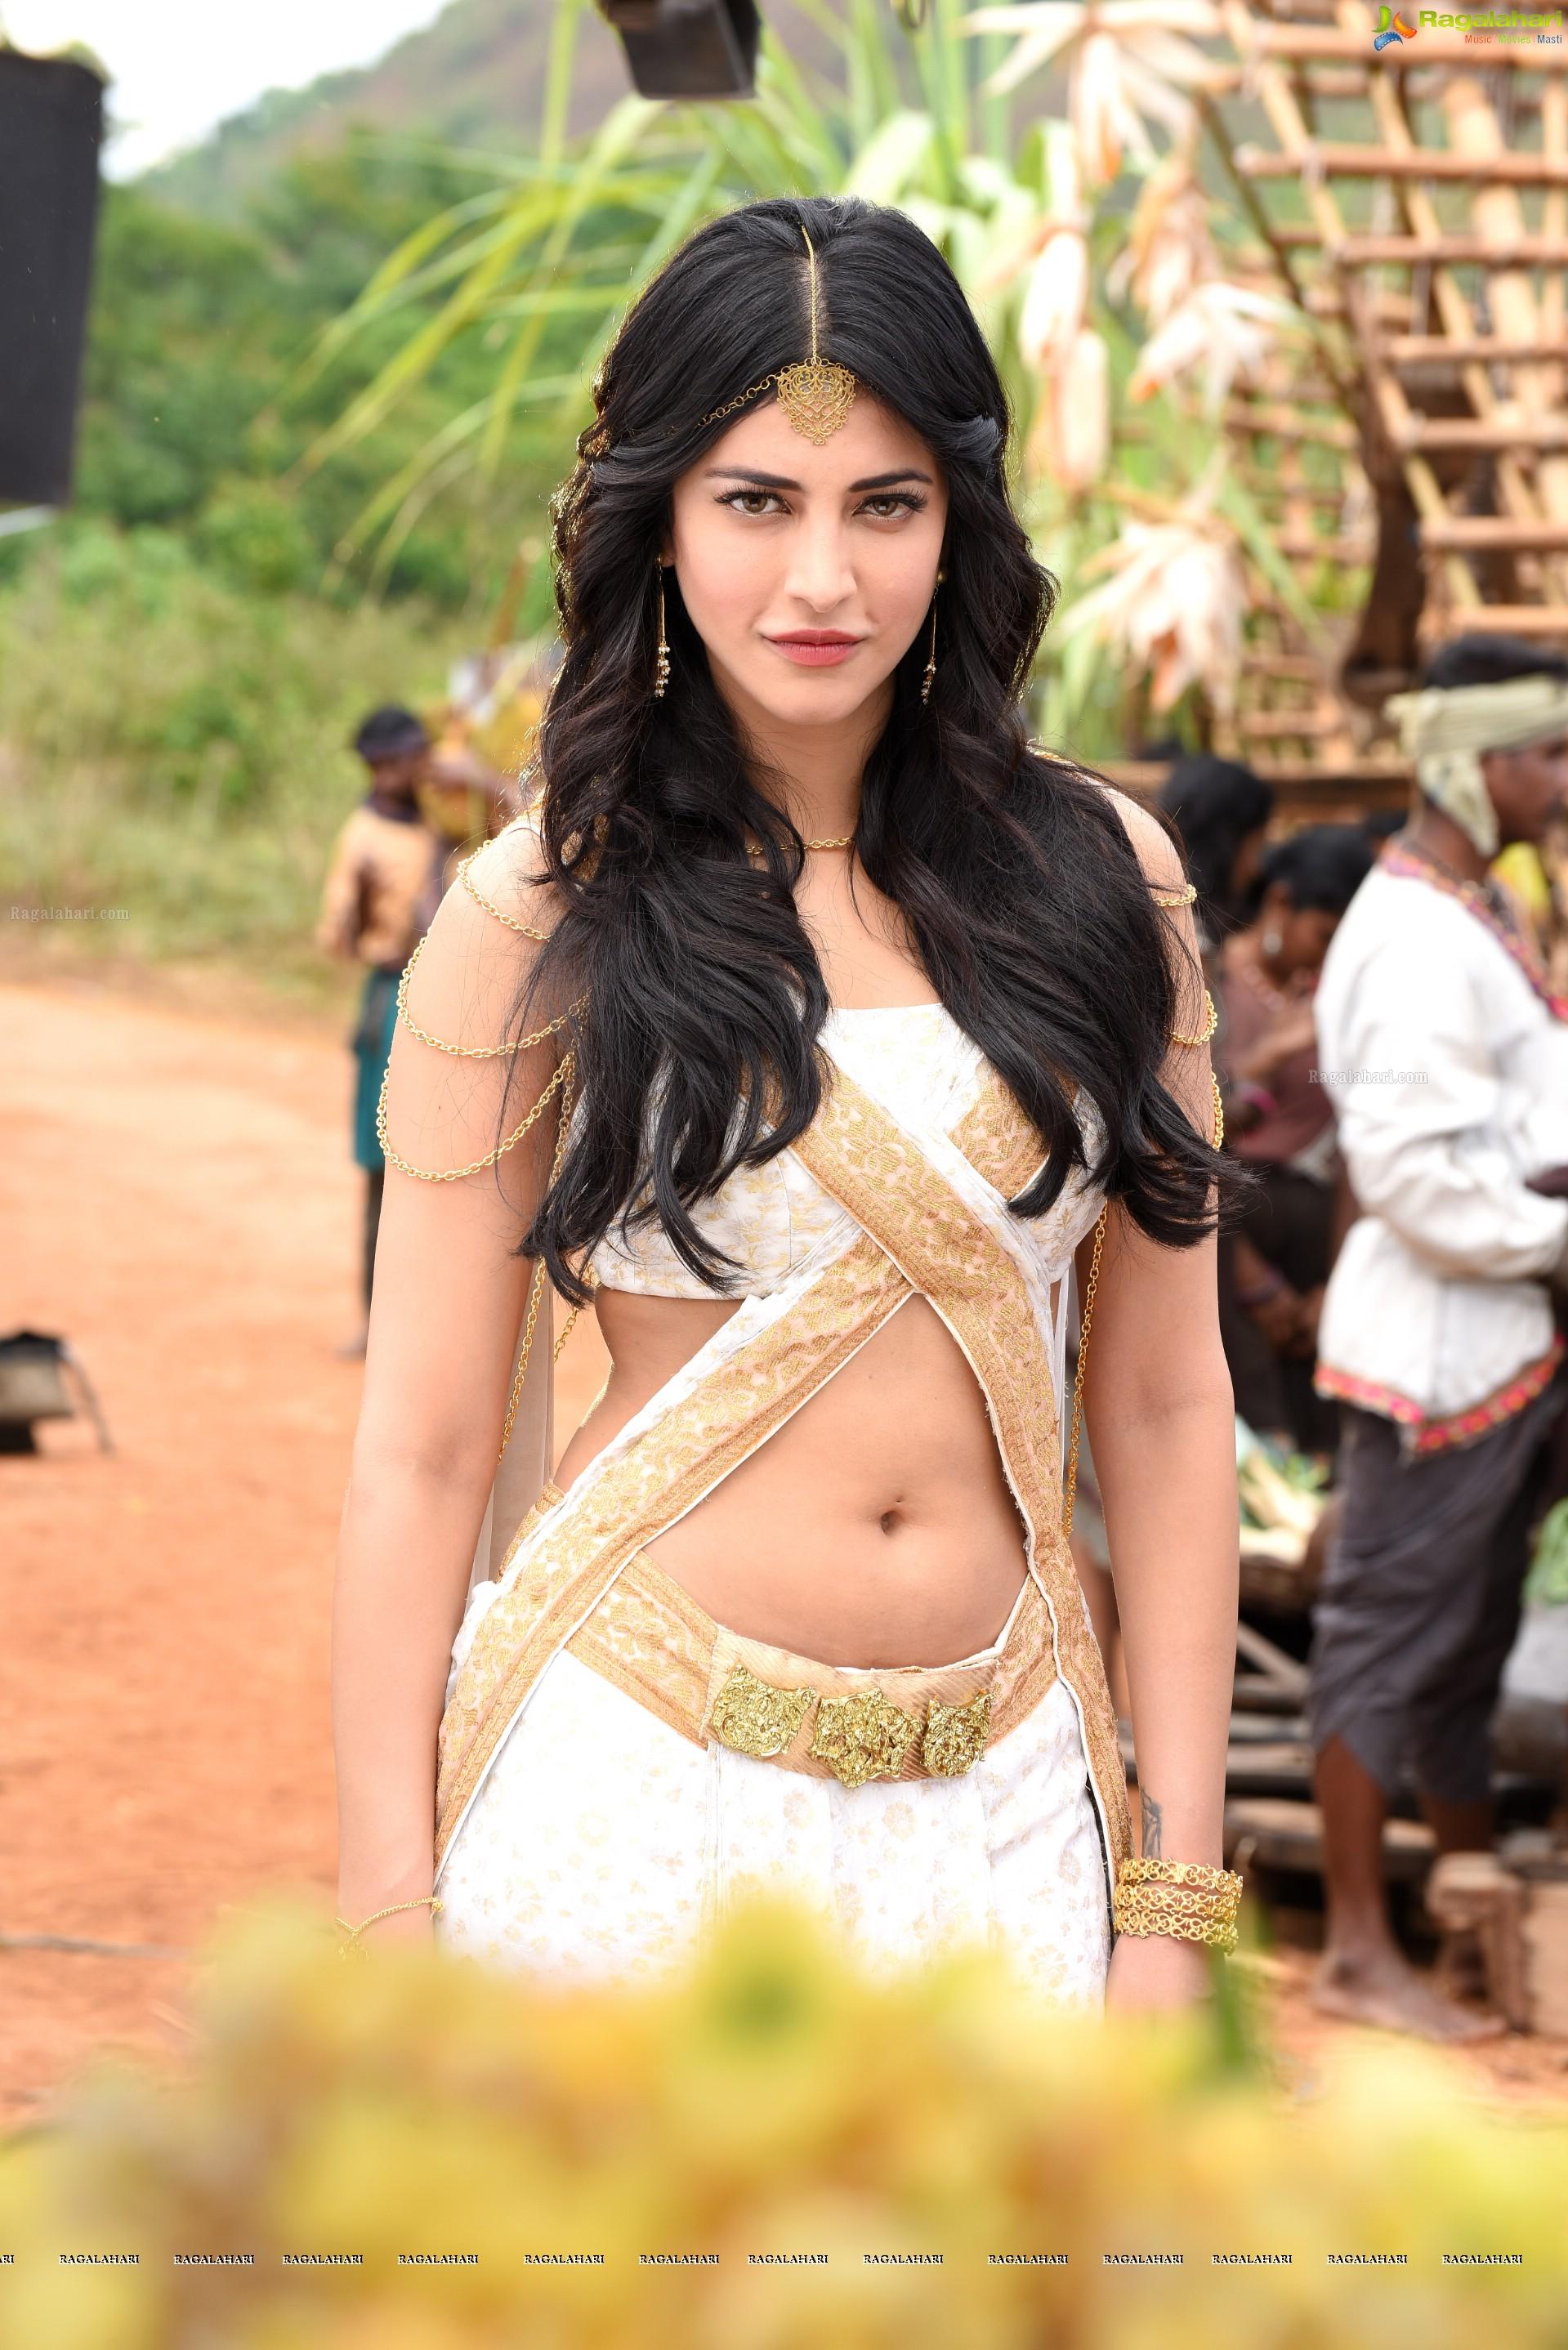 shruti haasan (high definition) image 10 | tollywood actress hot